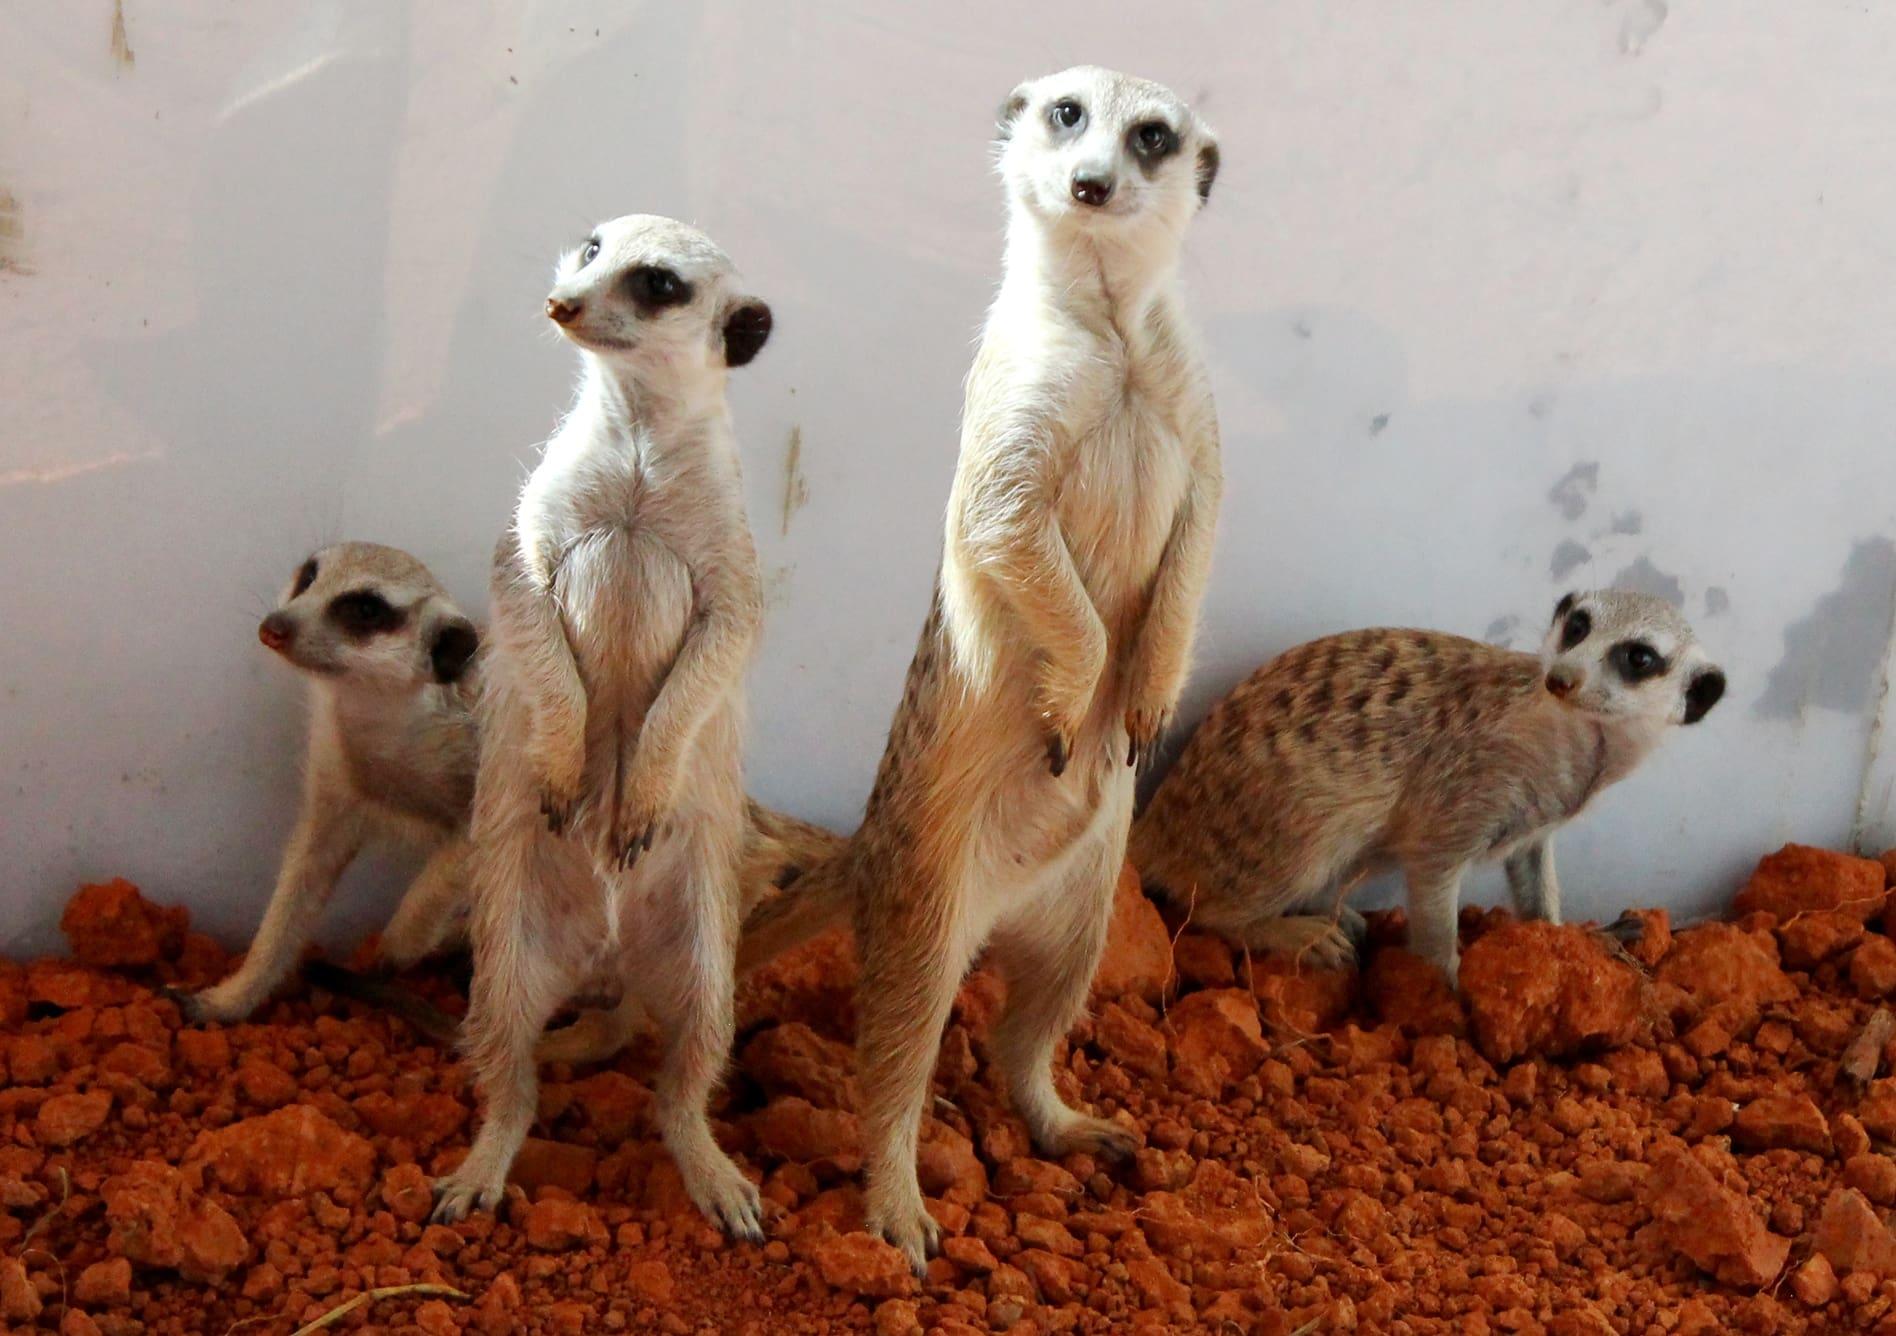 chồn đất tại khu african safari